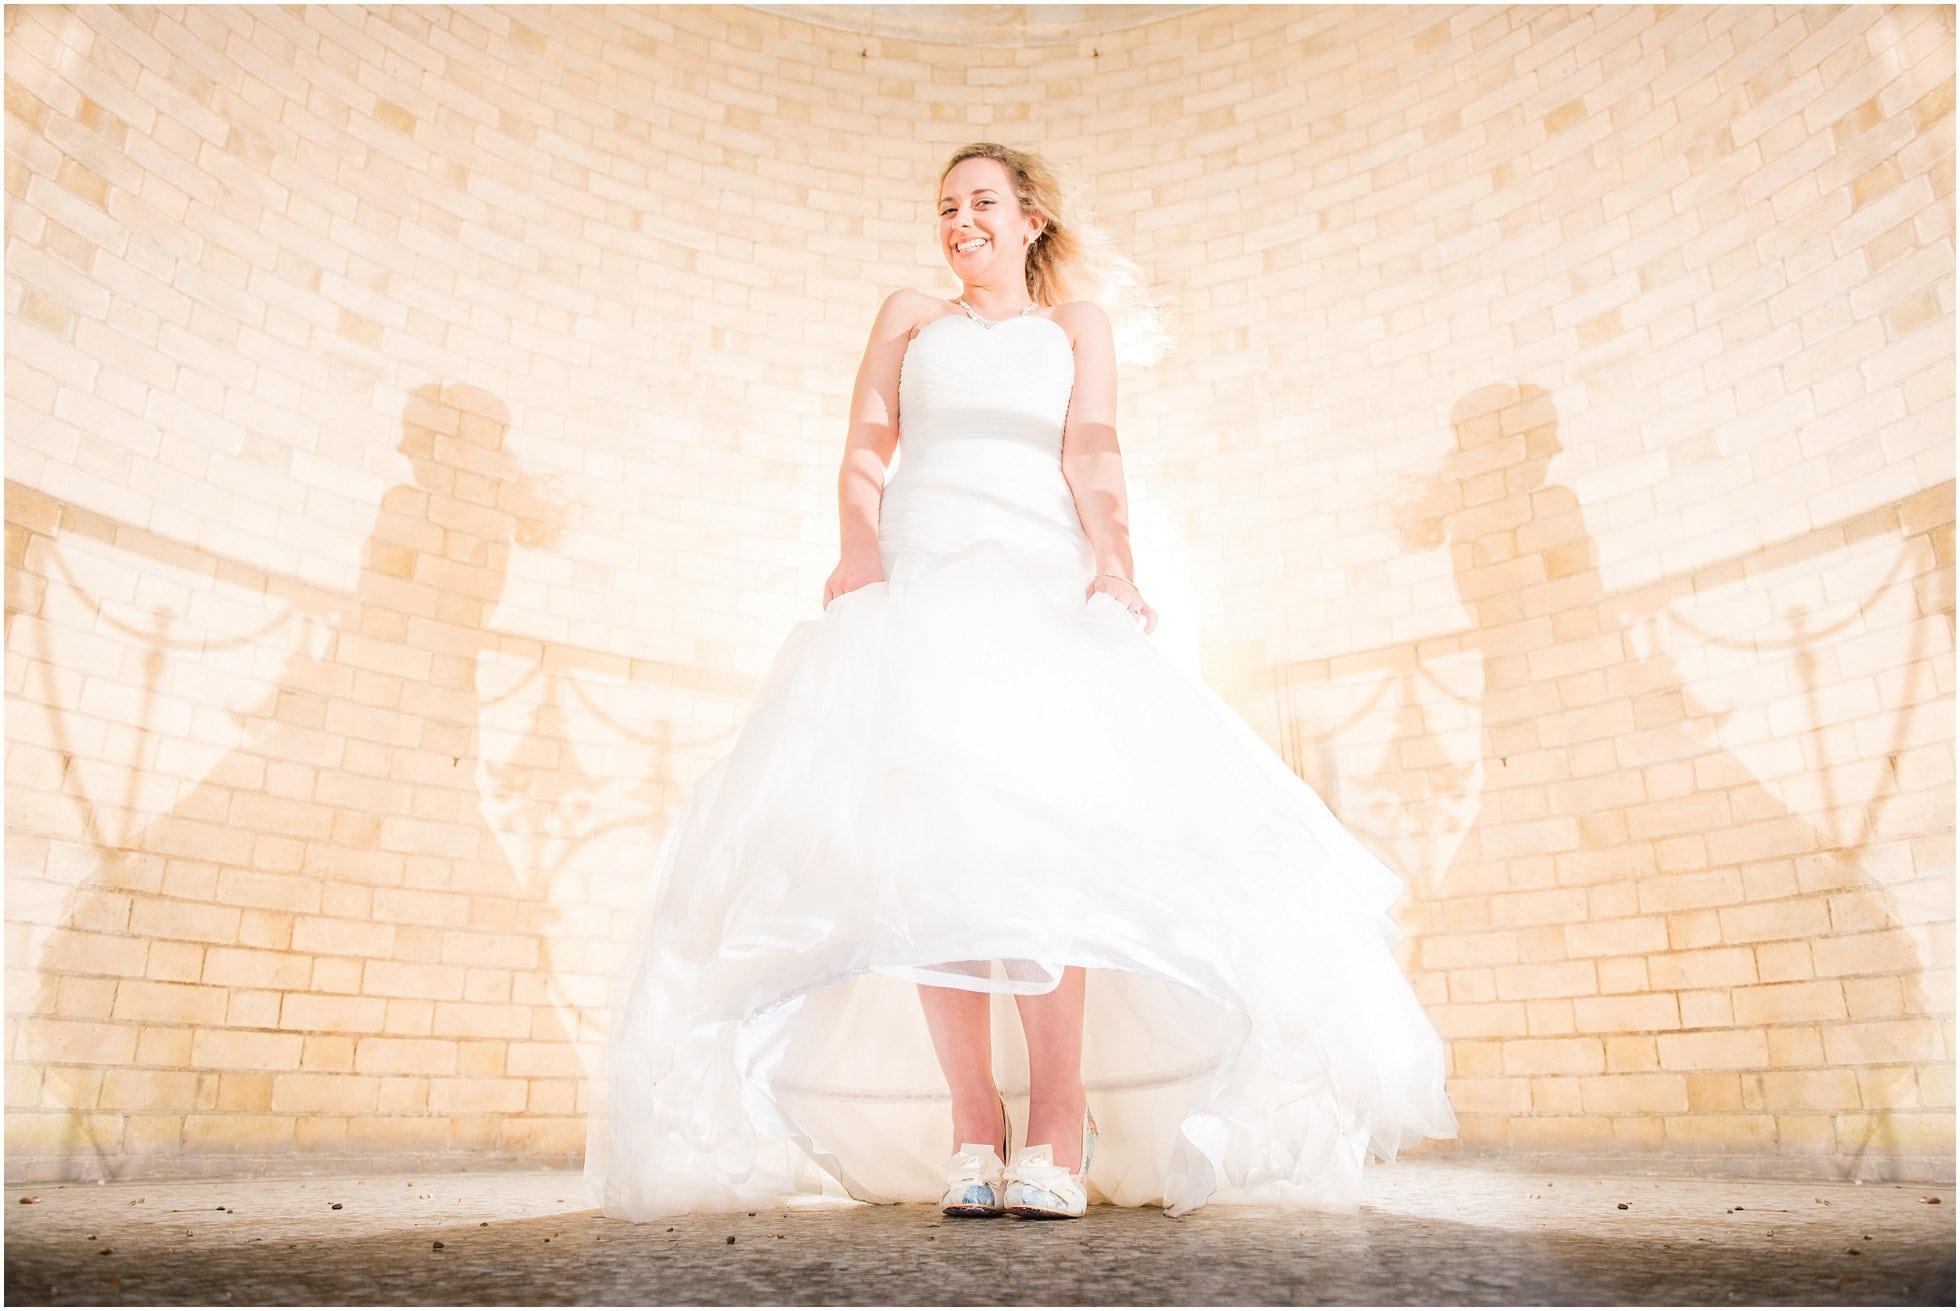 The bride having fun!